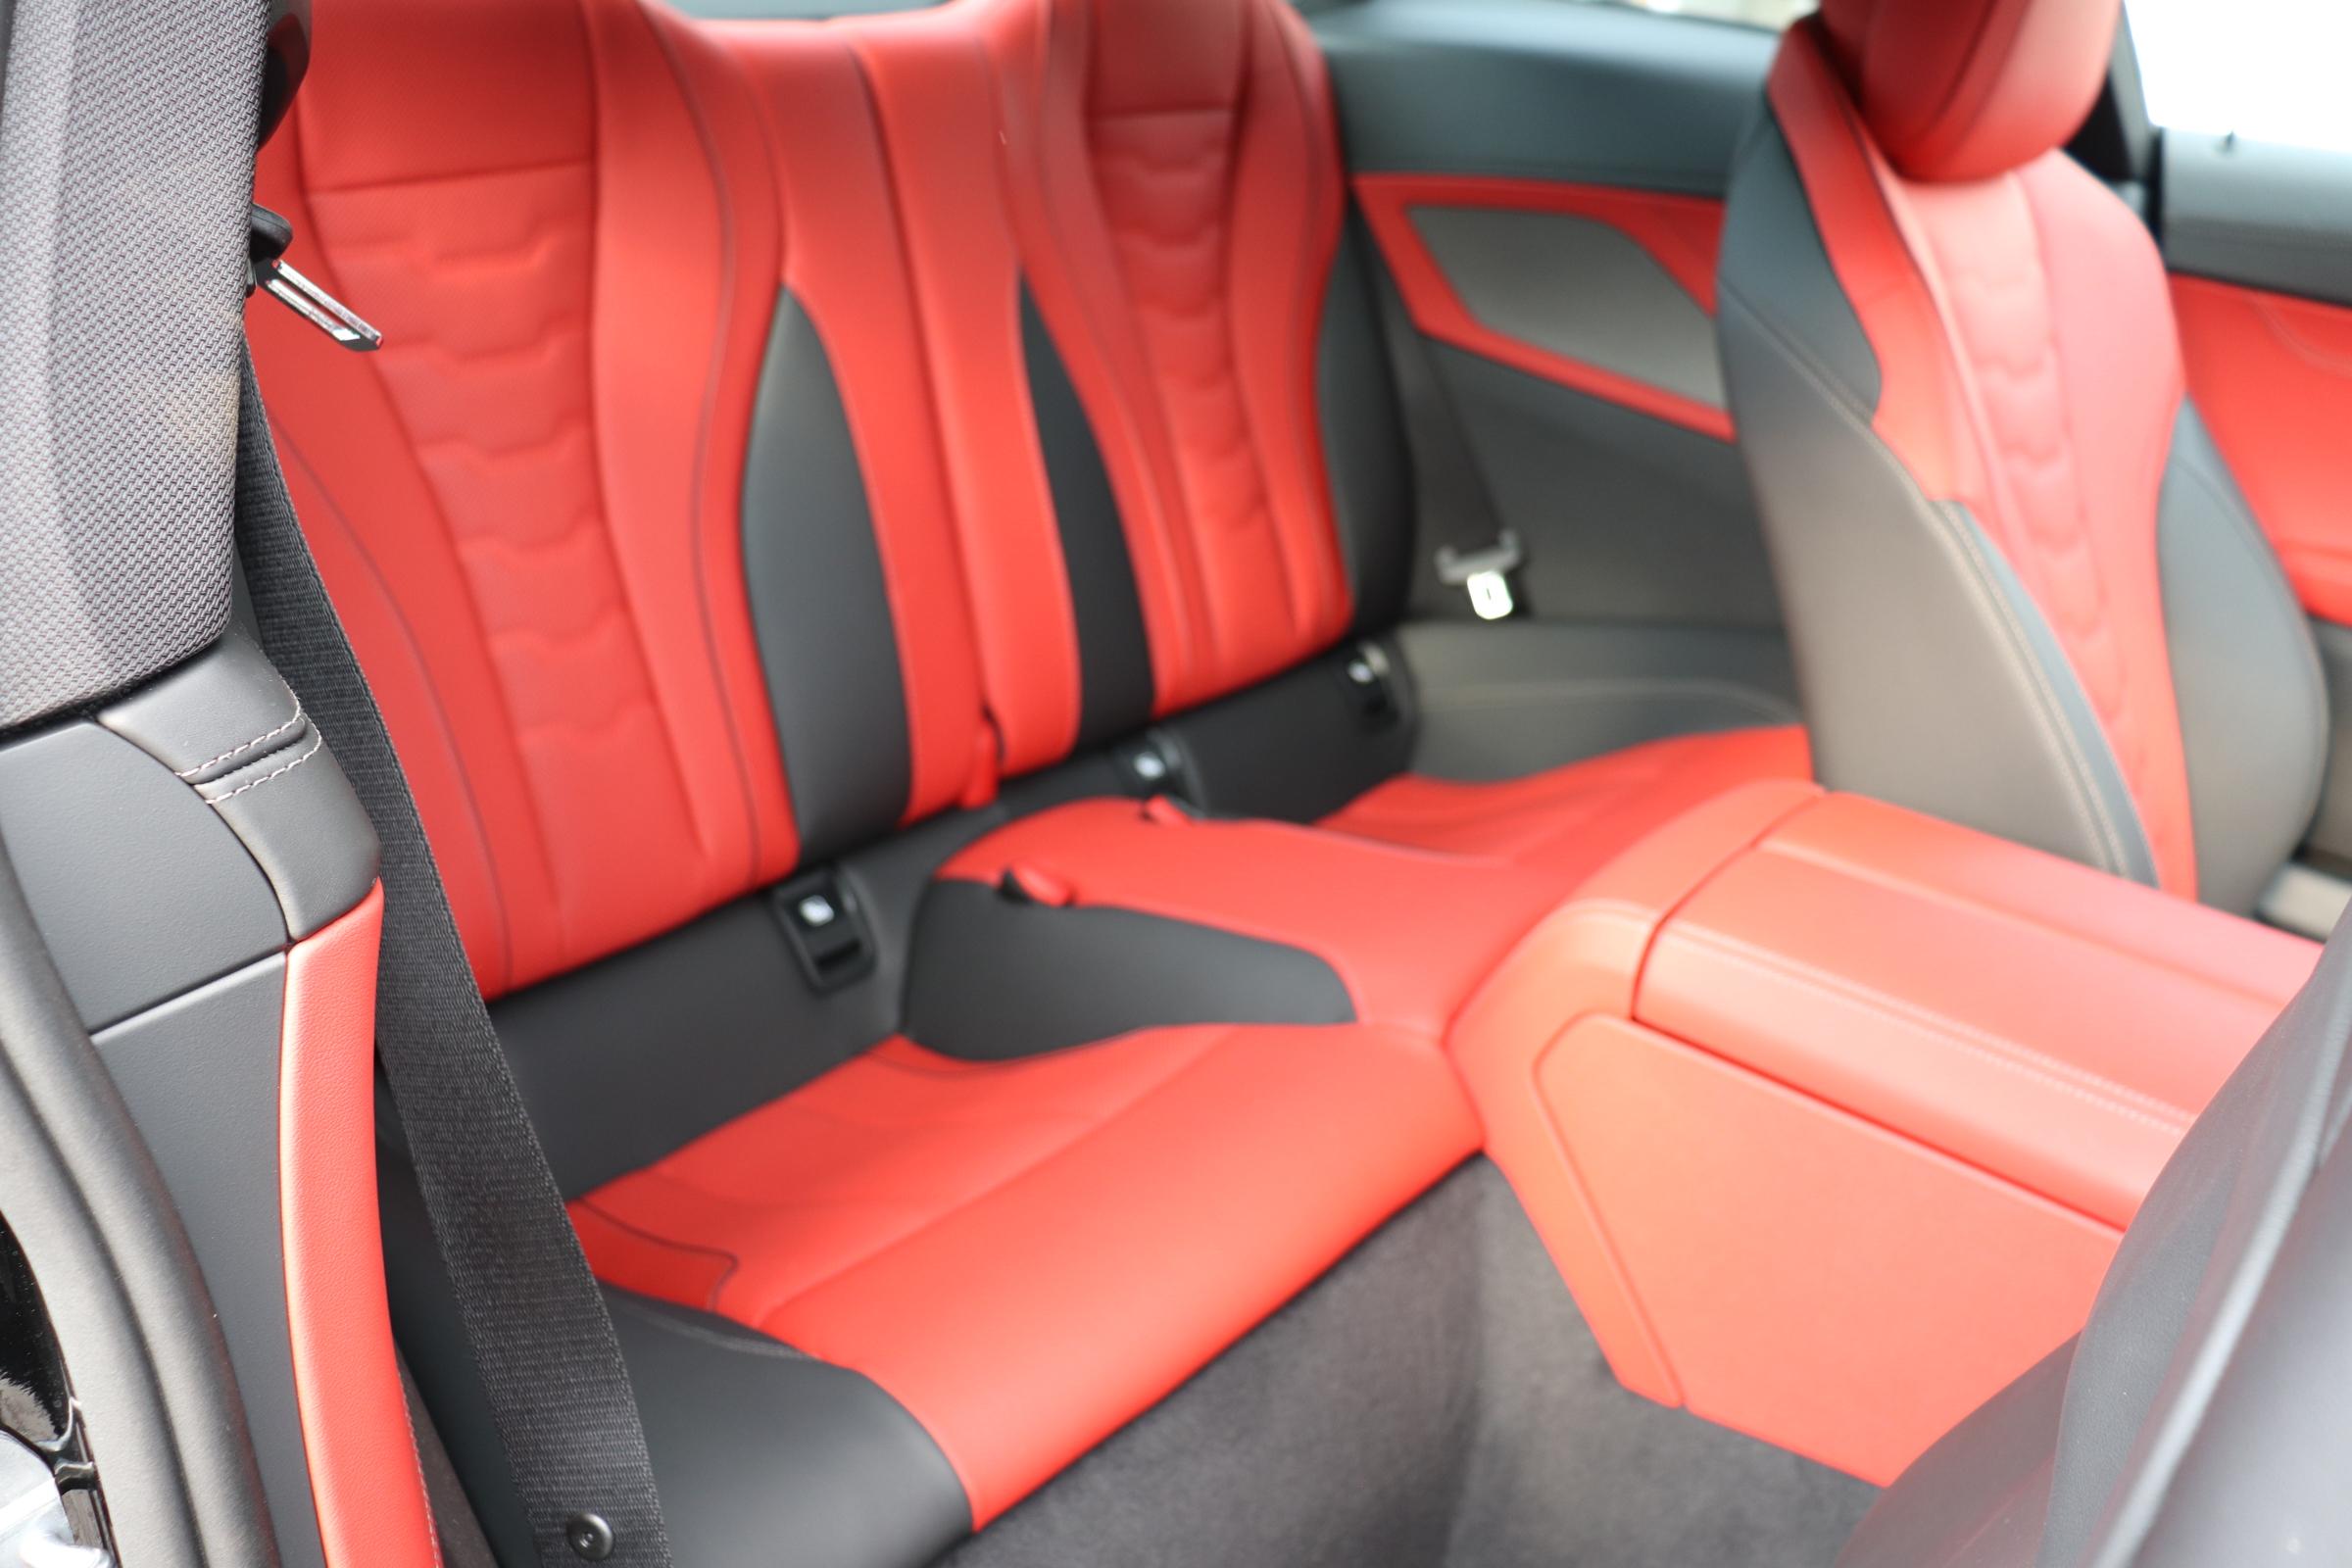 M850i xDrive クーペ カーボンルーフ バイカラーインテリア レーザーライト車両画像12